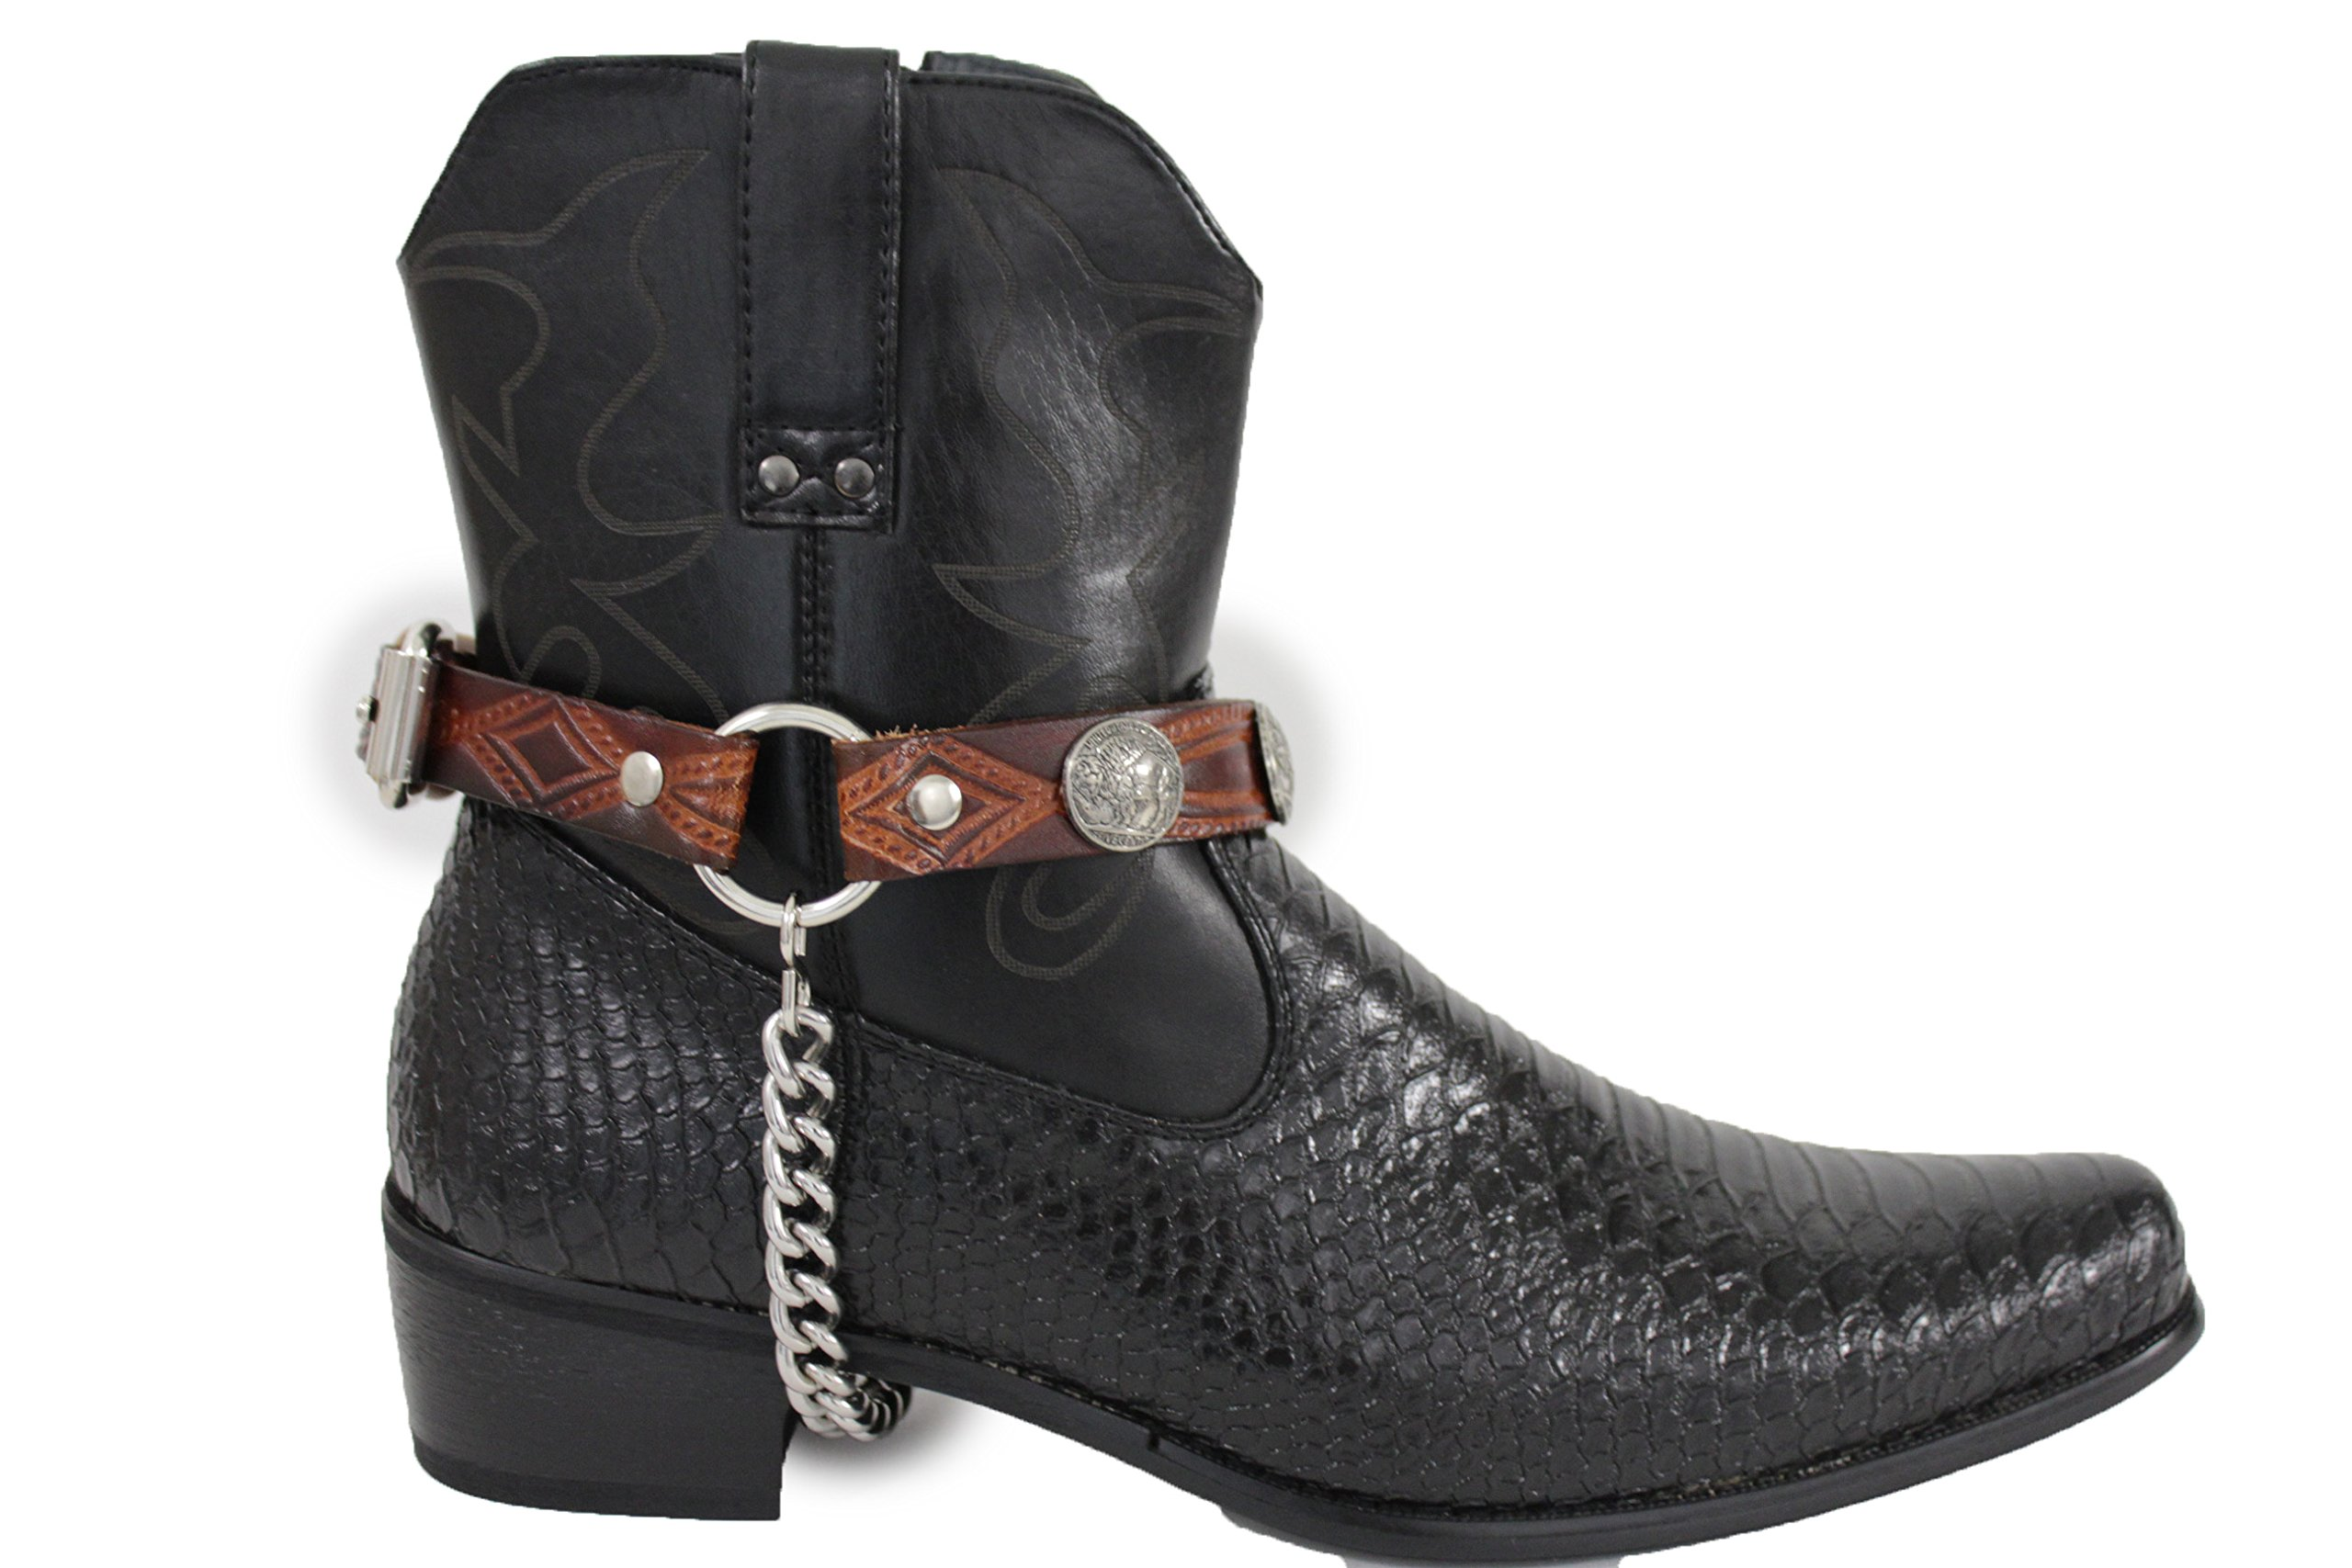 TFJ Men Biker Jewelry Boot Bracelets Brown Leather Straps Silver Metal Chains Bull Buffalo Pair Detail